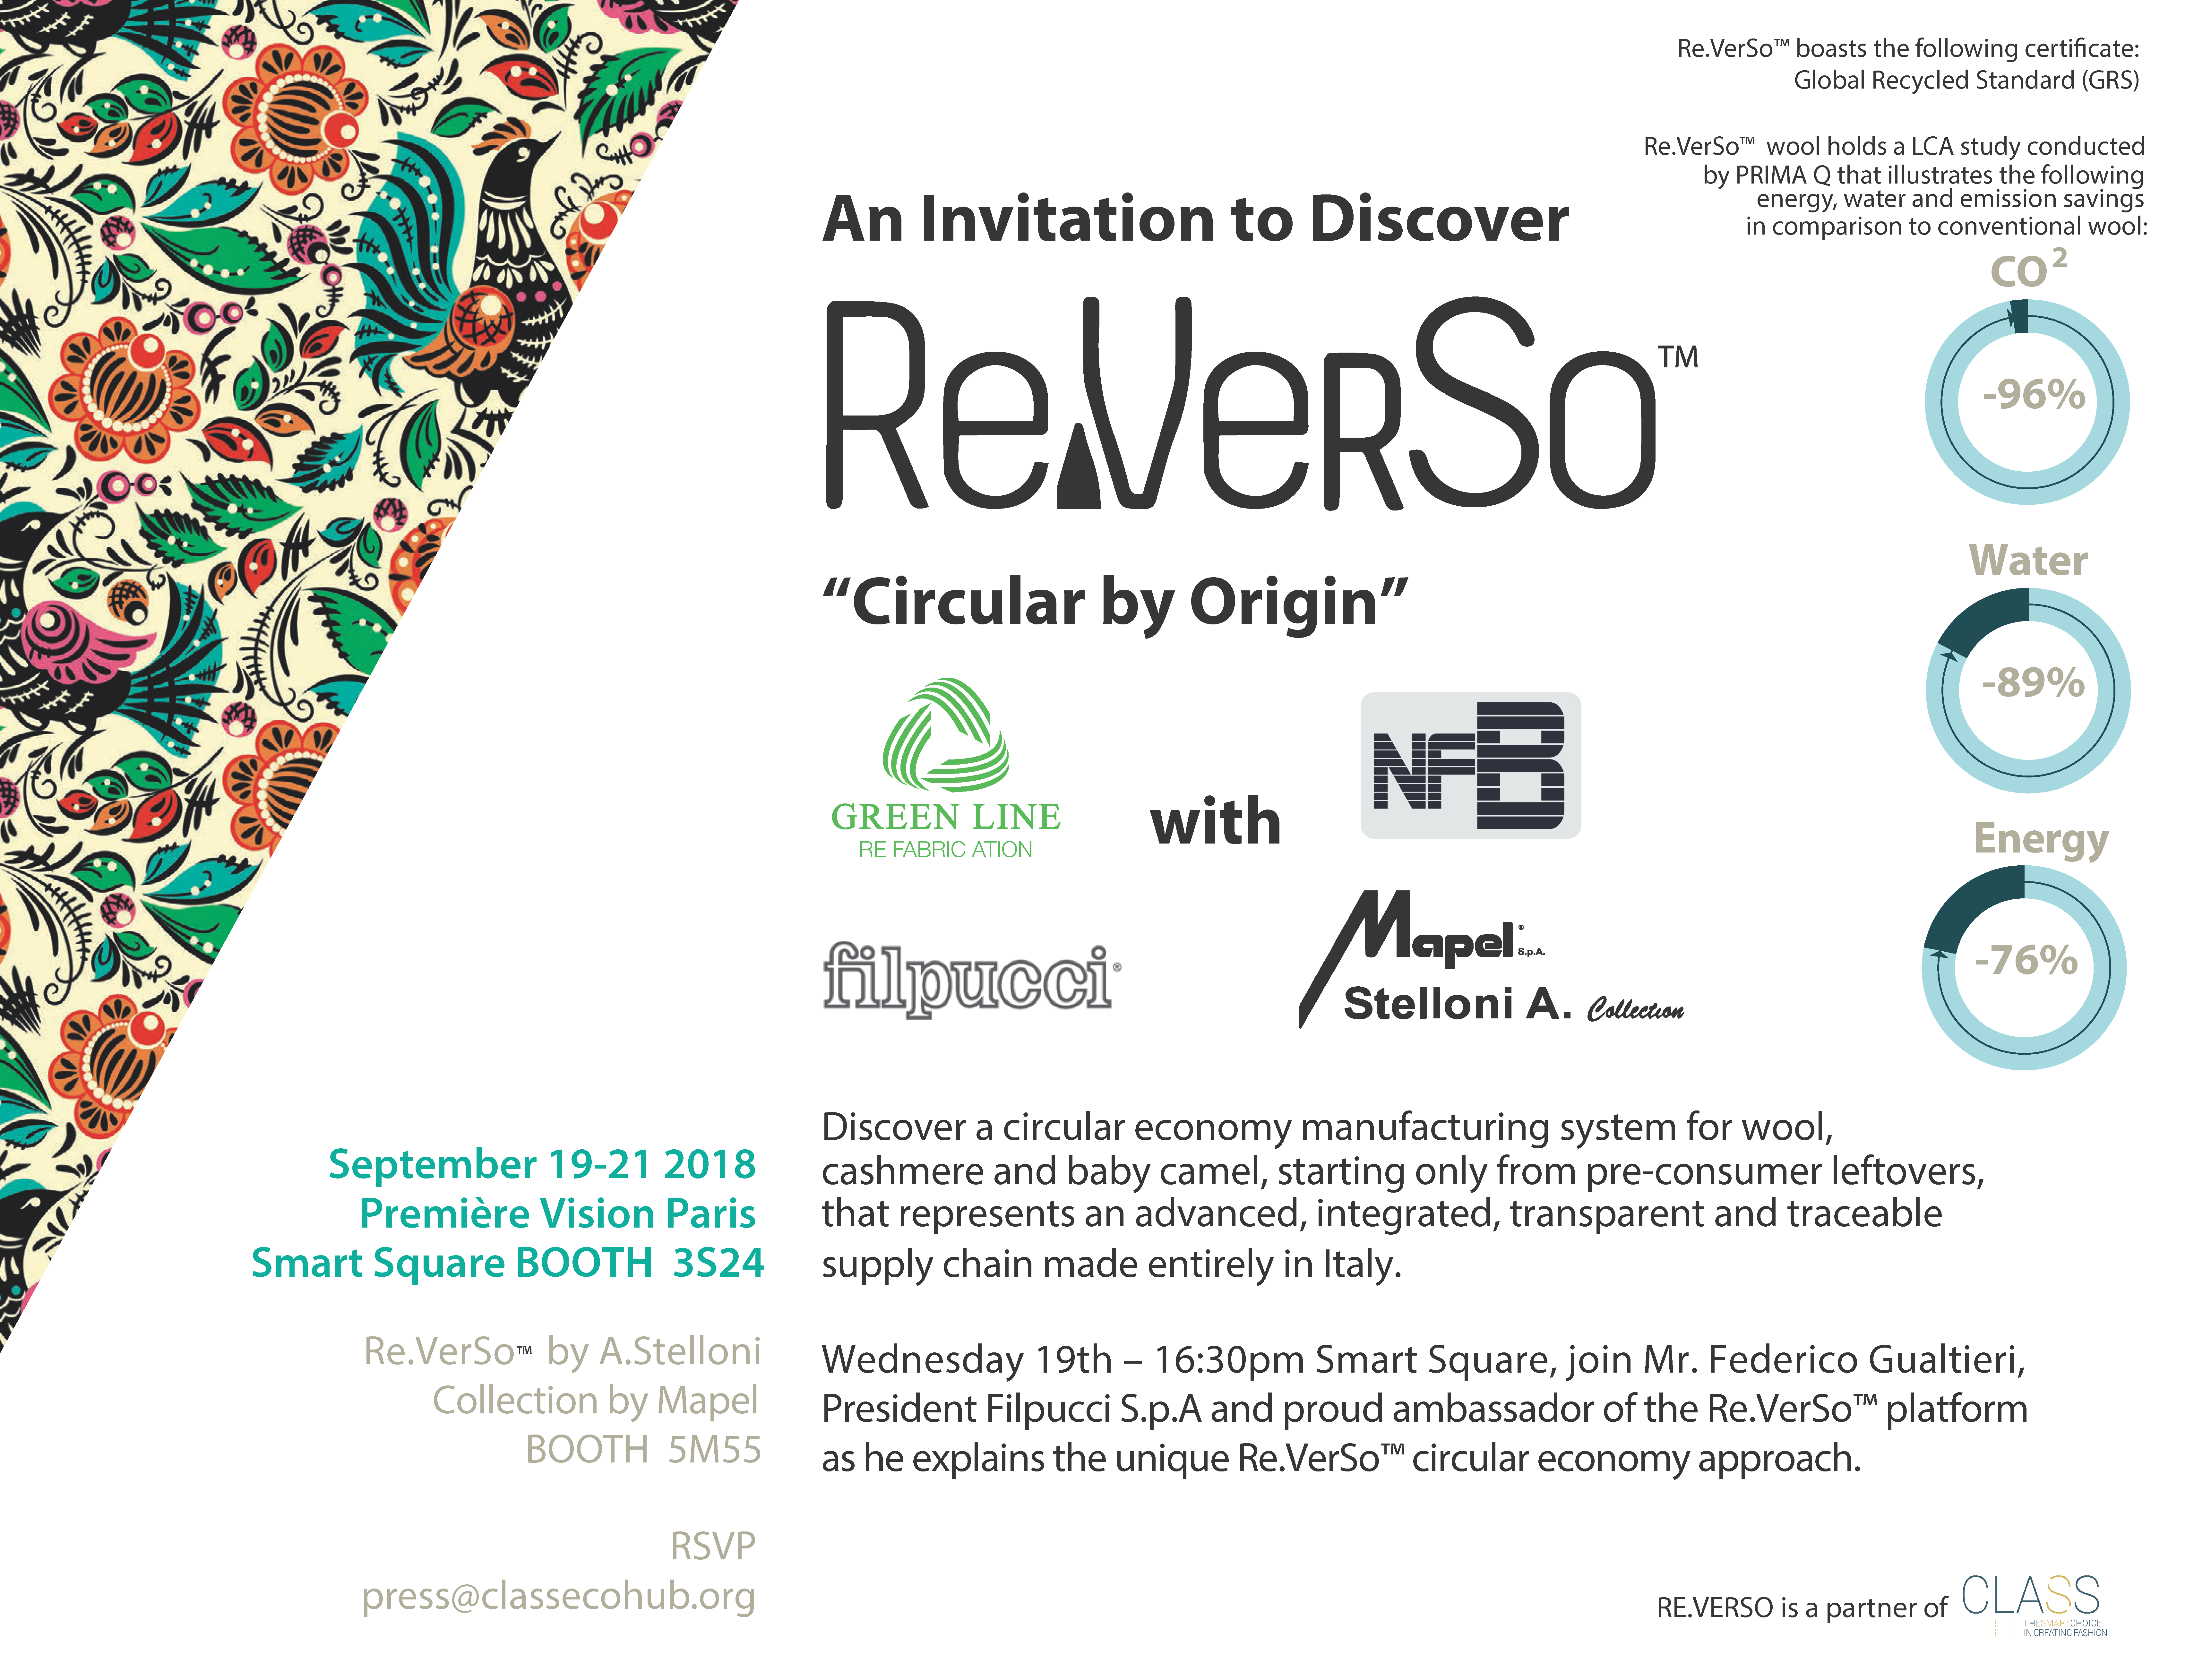 Re.VerSo™, Circular by Origin, Beautiful by Design